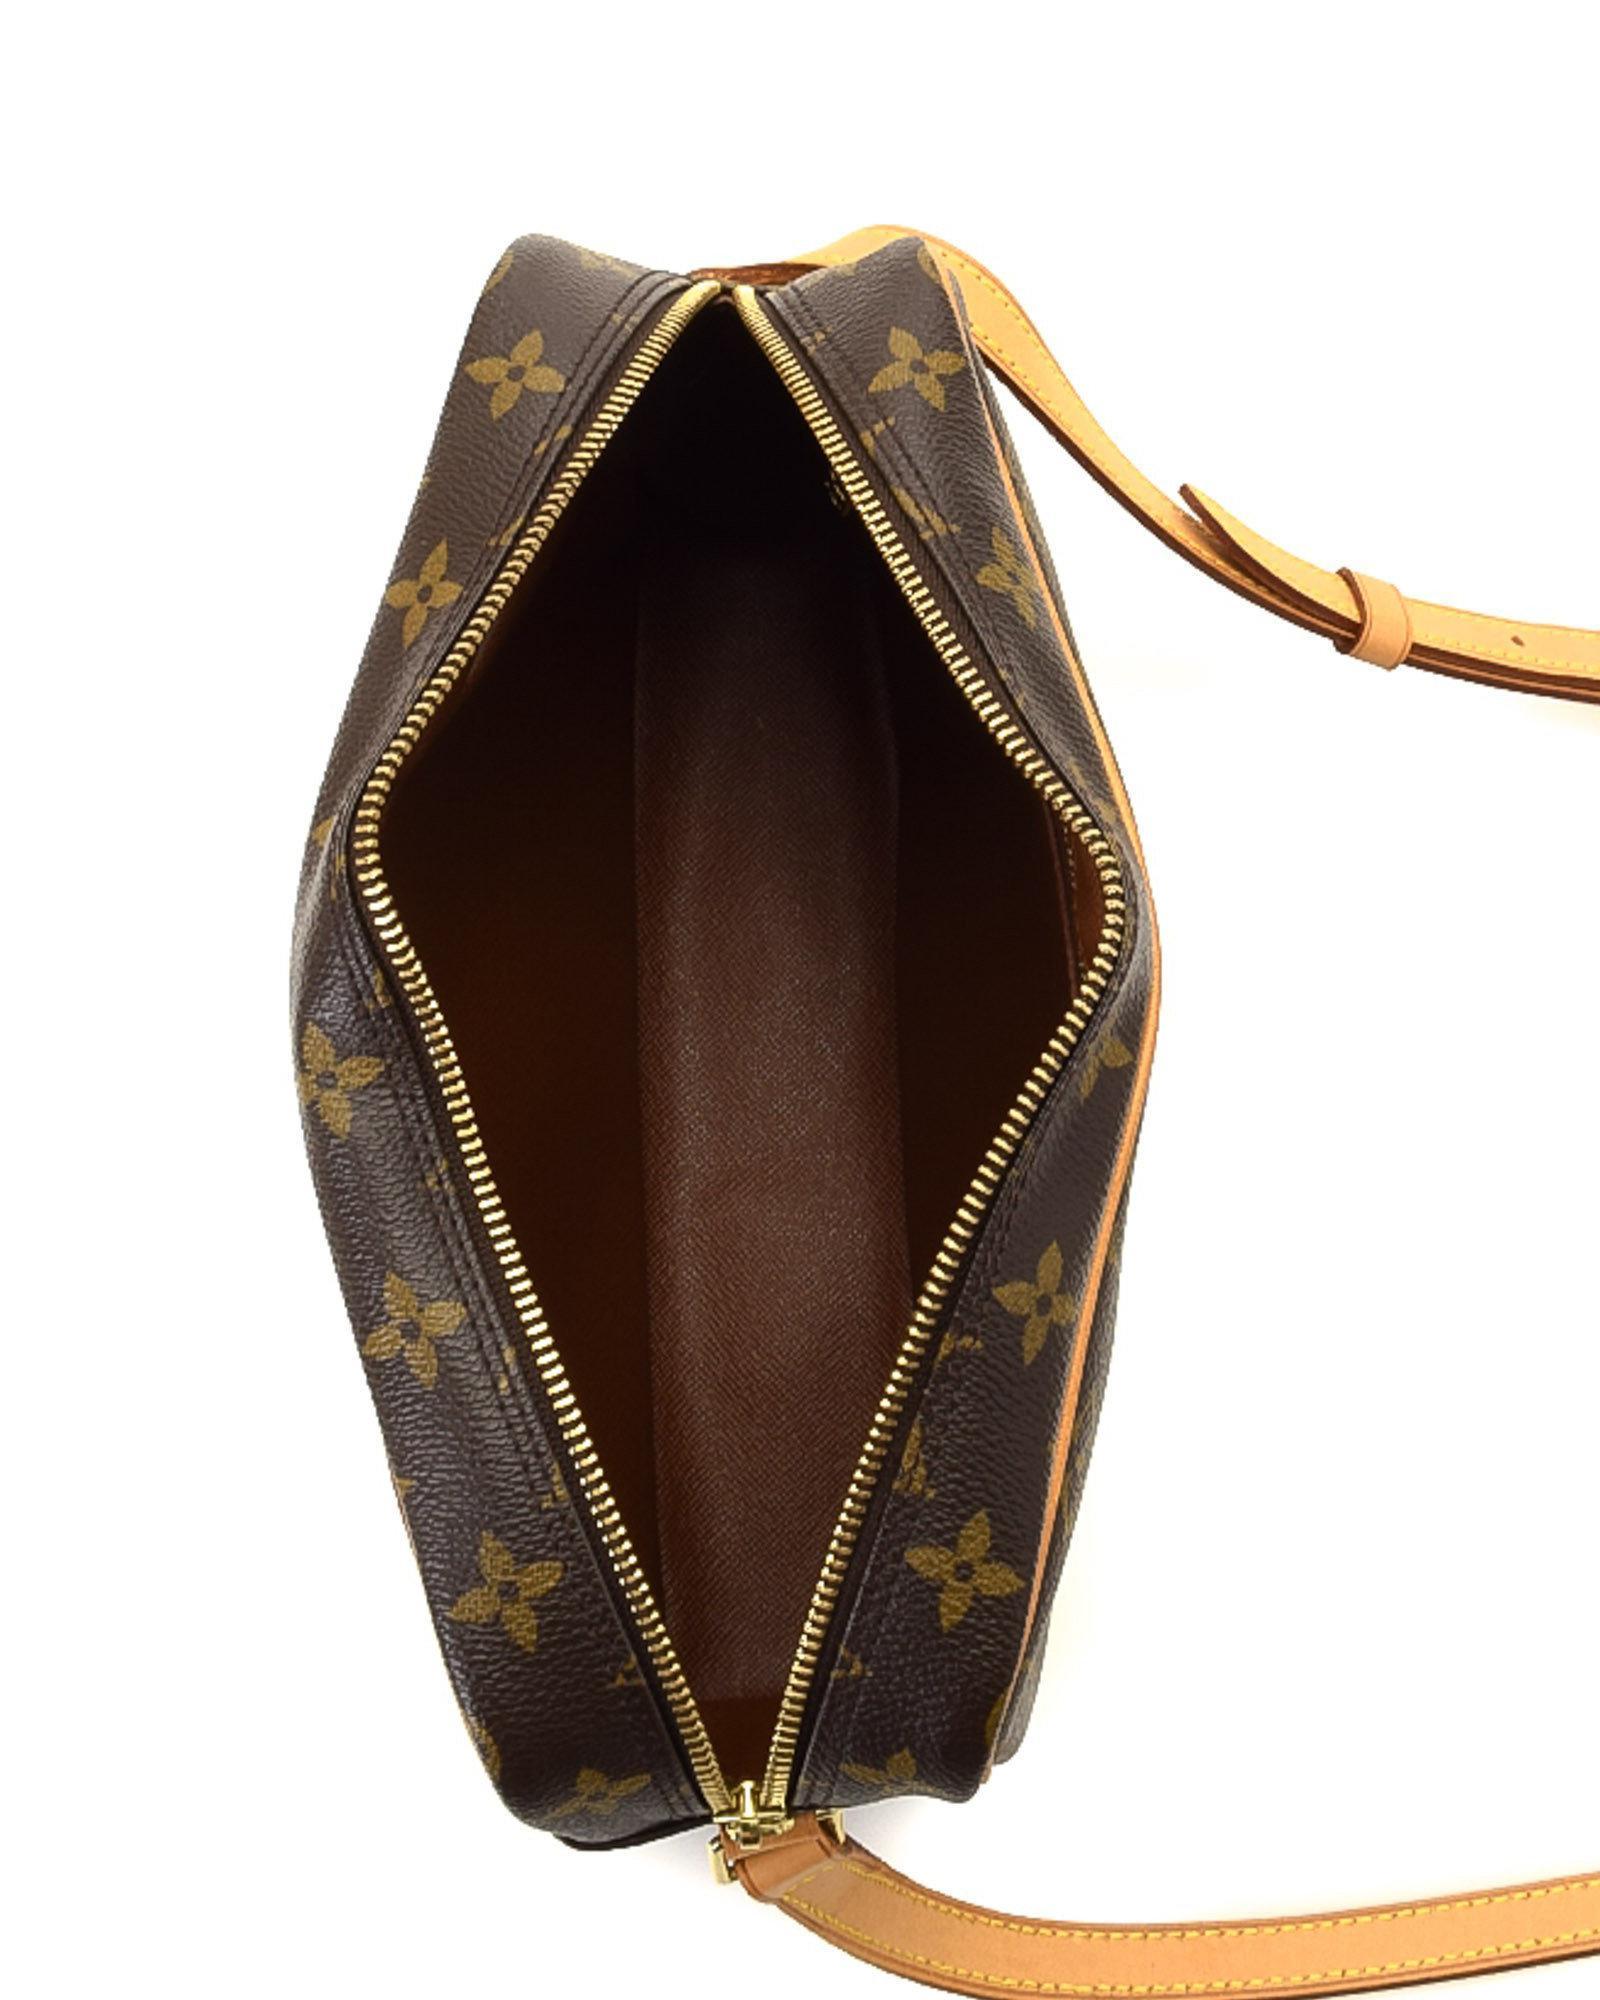 Lyst - Louis Vuitton Trocadero 27 Crossbody Bag - Vintage in Brown 41dd0879b5e2e